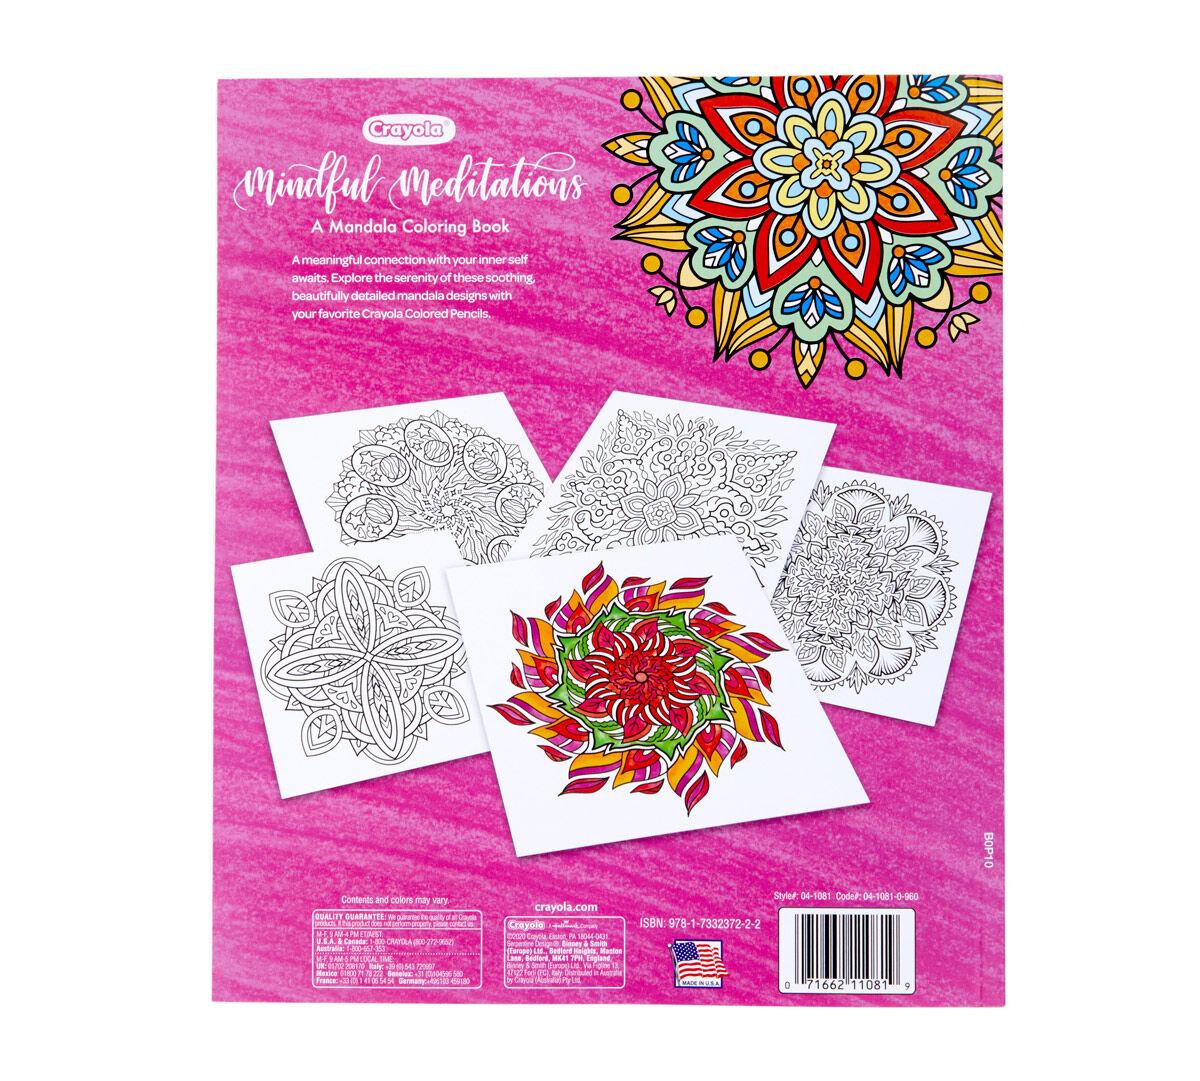 Mandala Coloring Book, 40 Coloring Pages Crayola.com Crayola